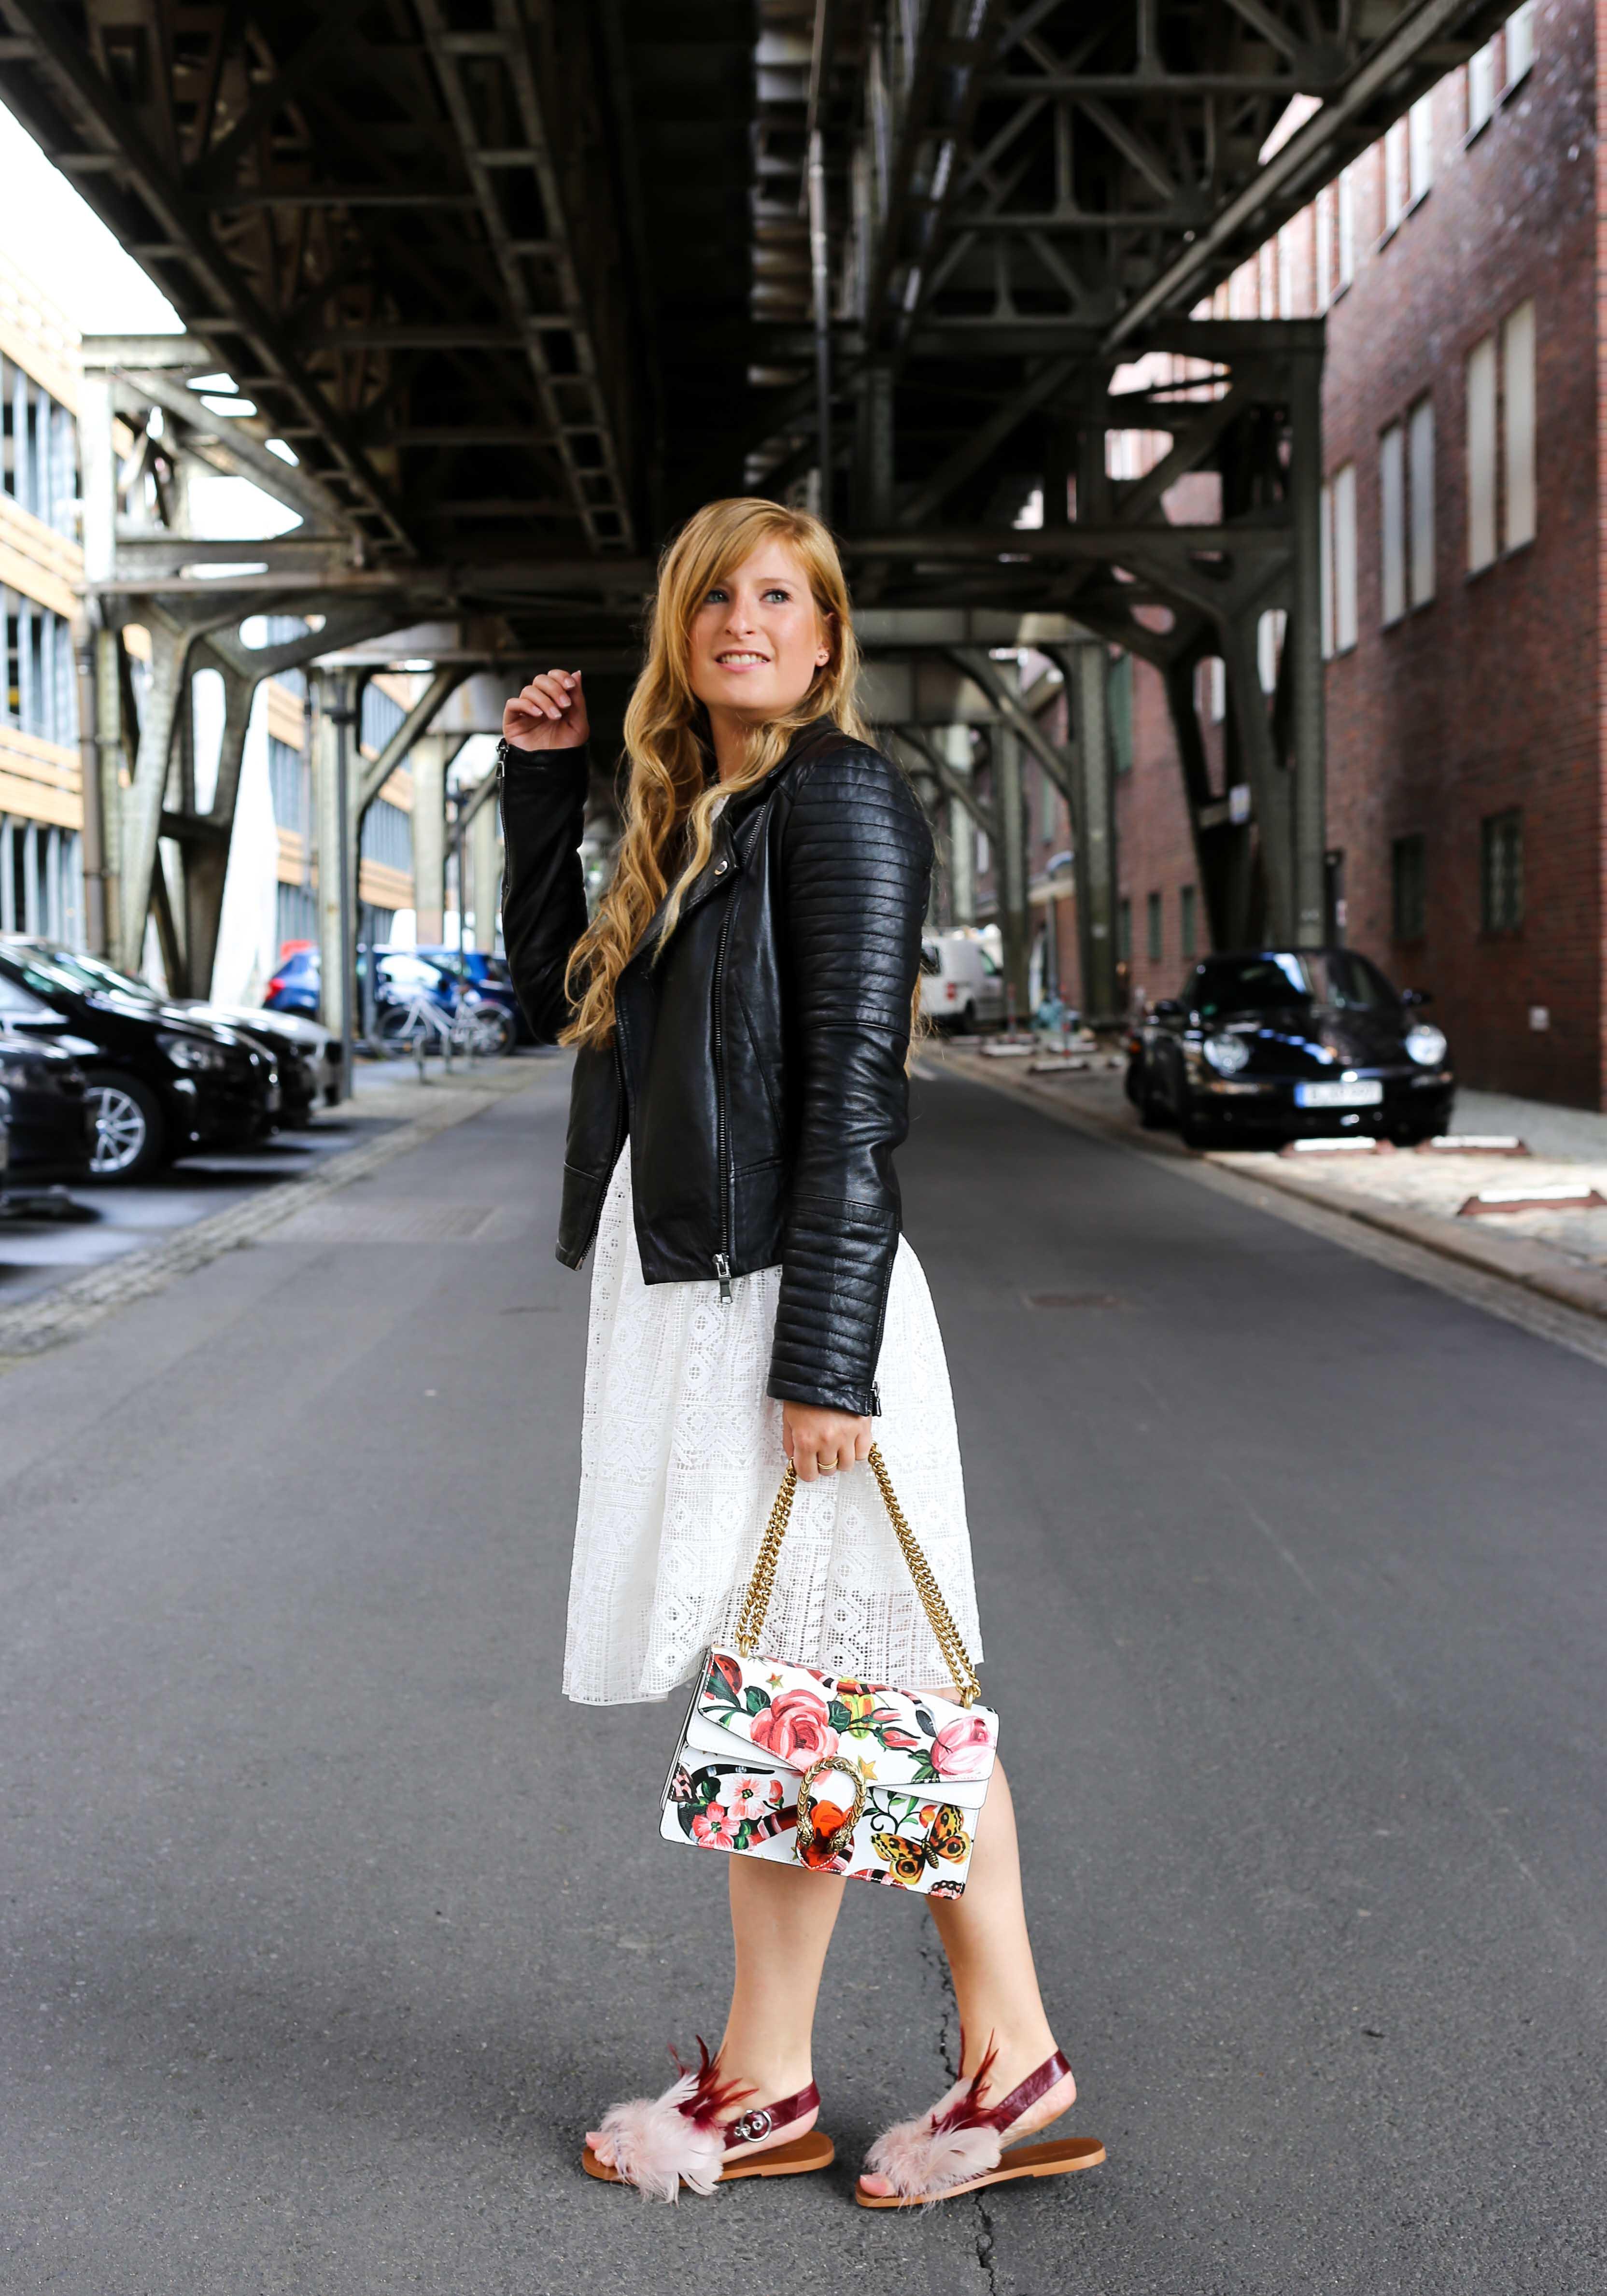 Fashion Week Outfit weißes Spitzenkleid Asos flache Ledersandalen mit Federn kombinieren Lederjacke Modeblog Deutschland Fashion Blogger OOTD 3